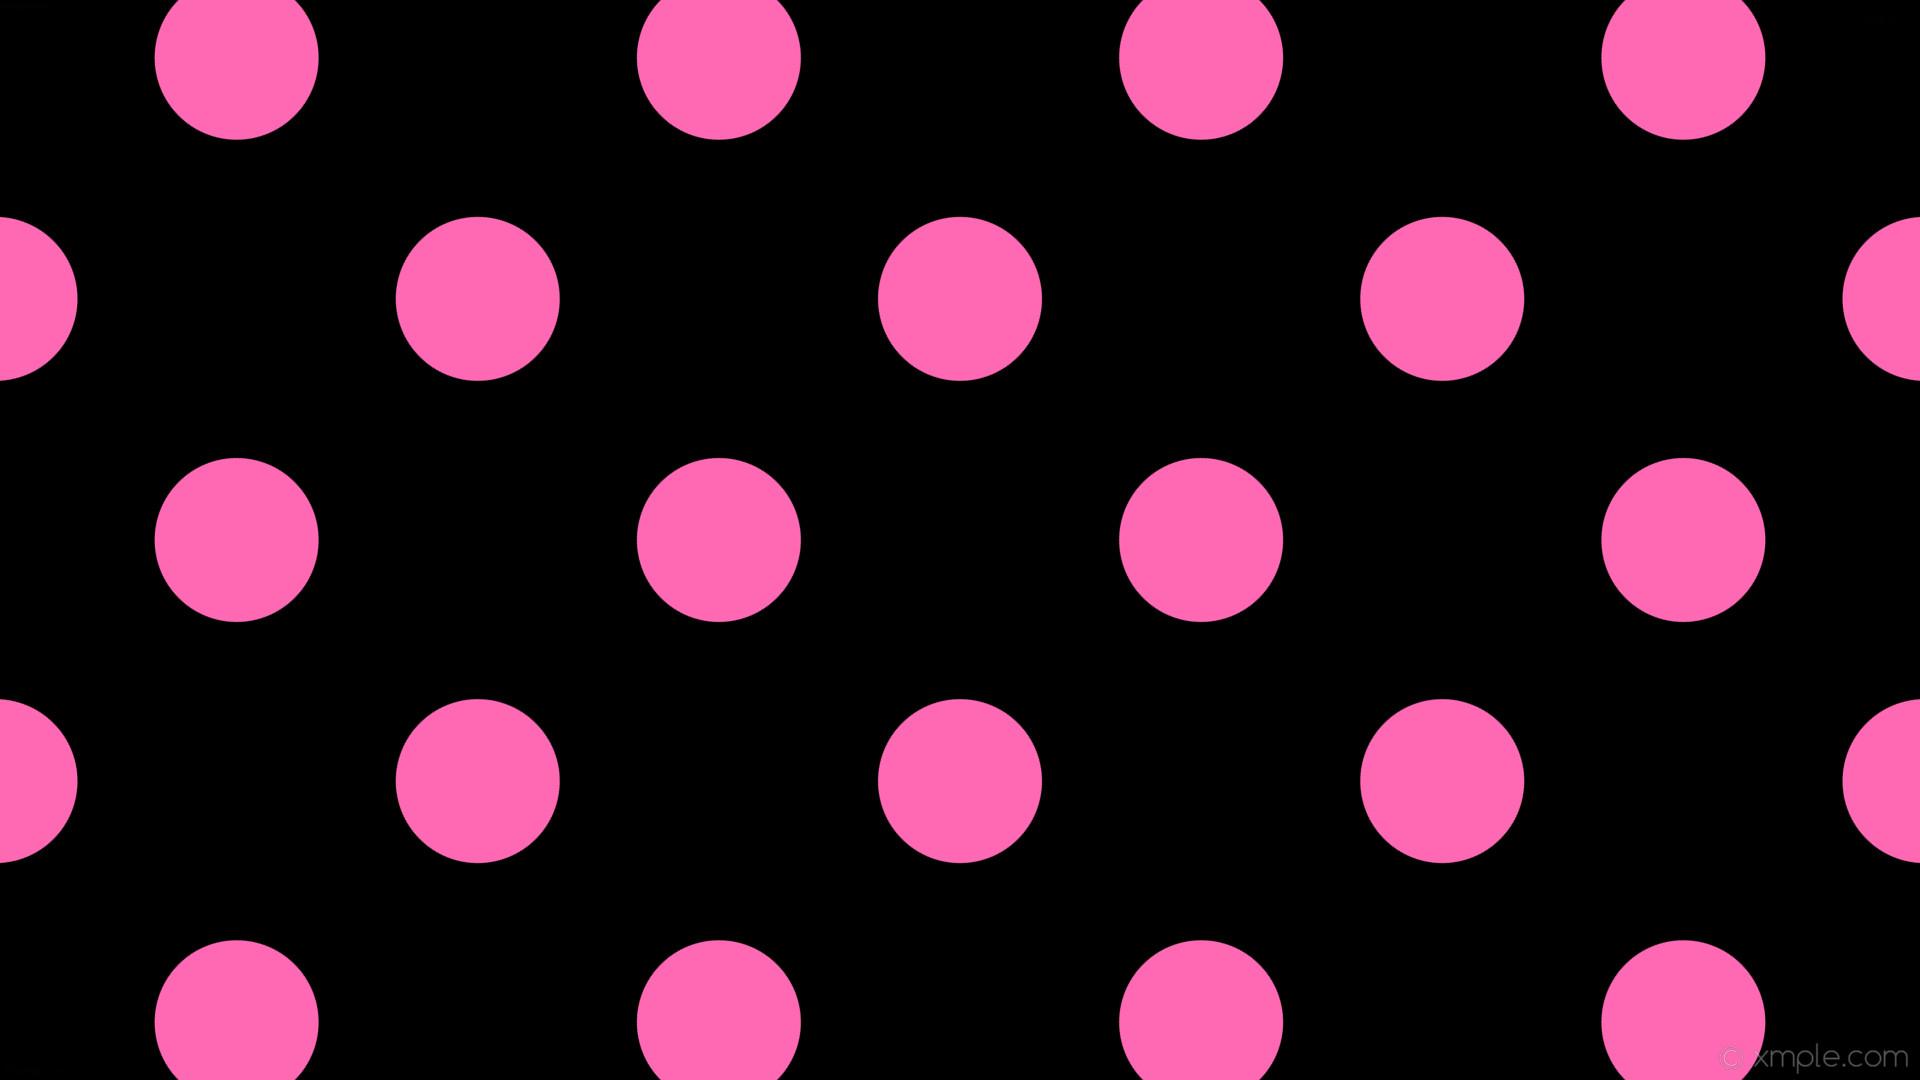 wallpaper spots black pink polka dots hot pink #000000 #ff69b4 315° 164px  341px